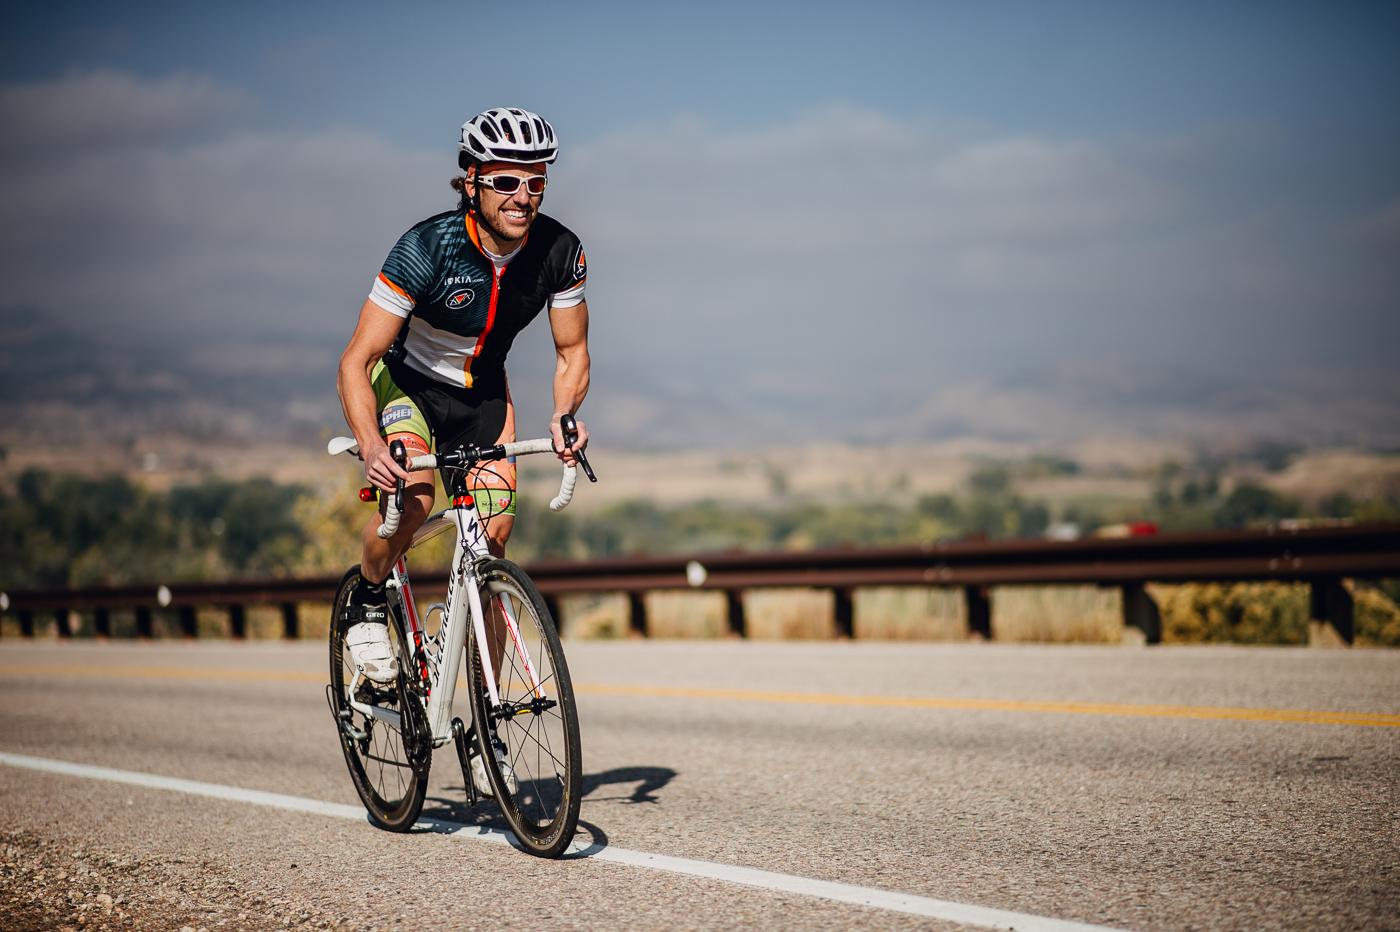 PHOCO Photography Fort Collins Colorado Portraits Headshots Downtown Cyclist-14.jpg